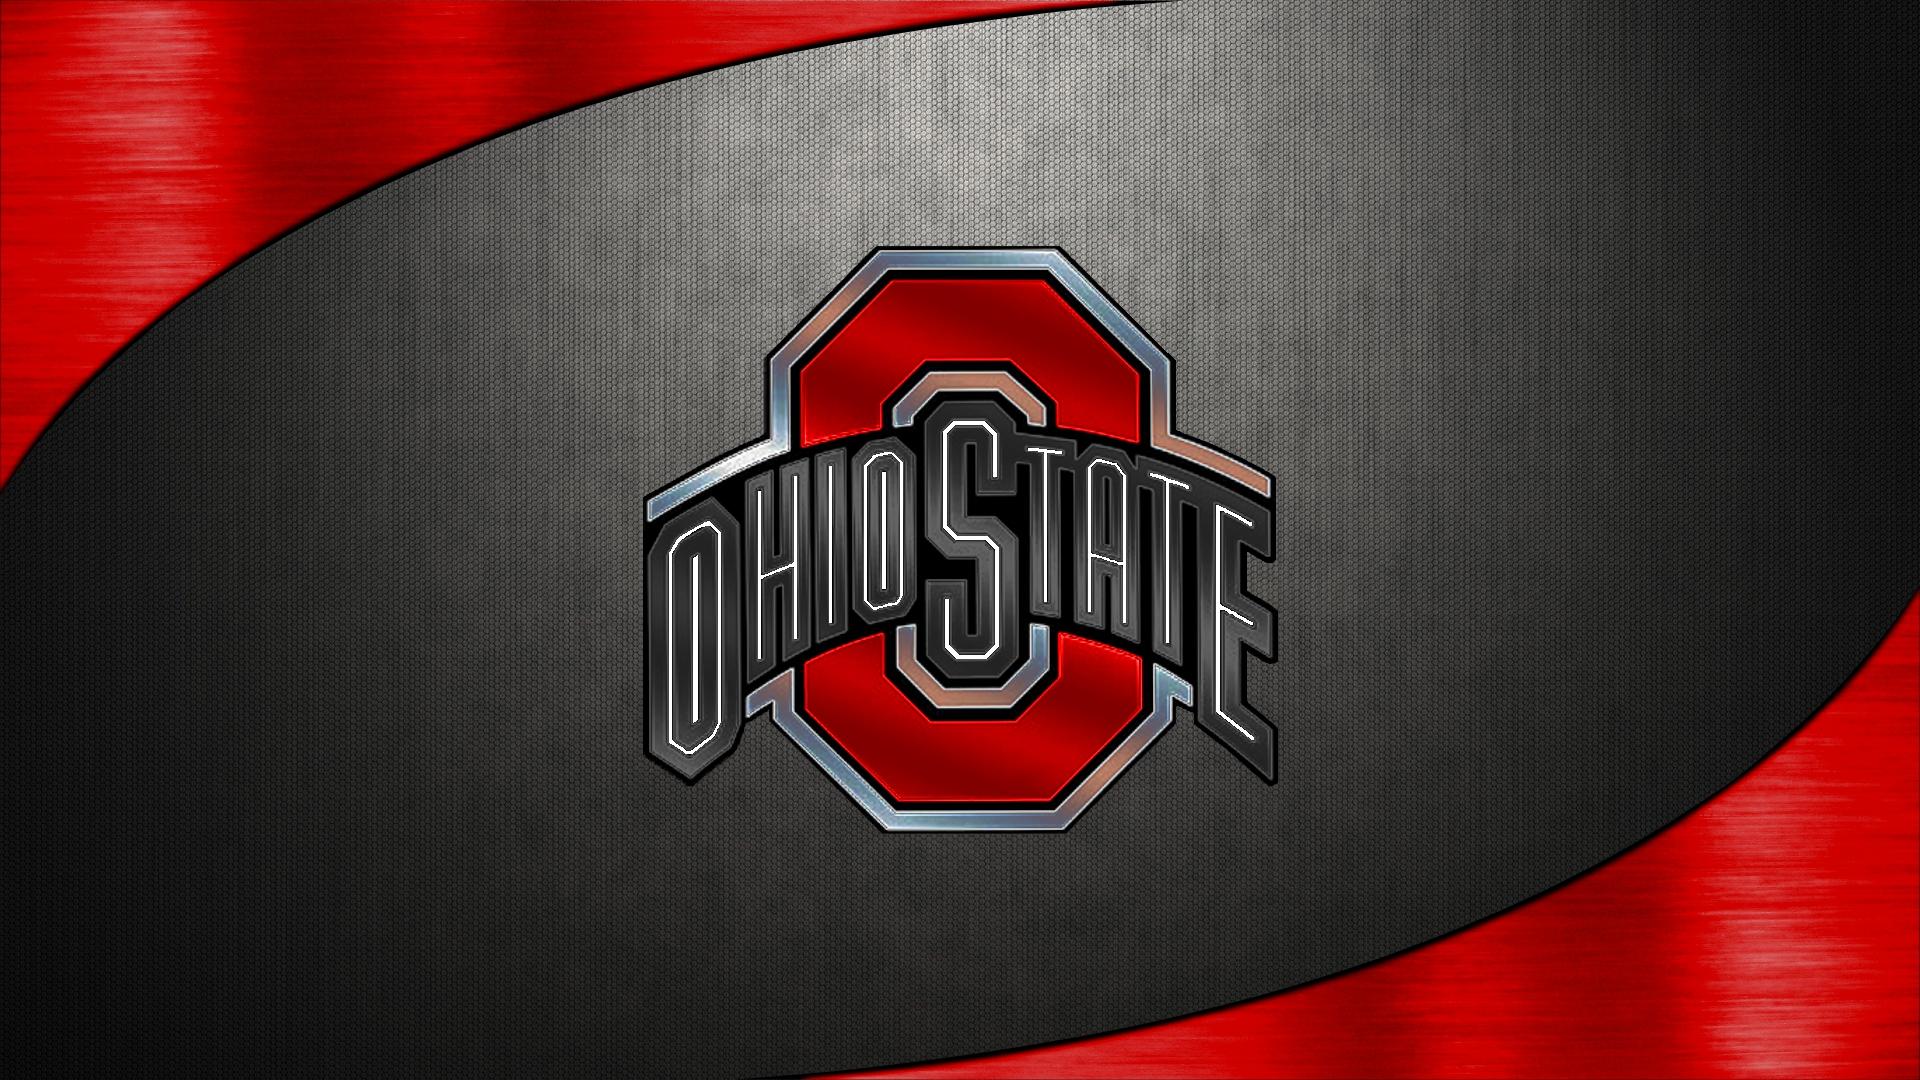 OSU Wallpaper 447   Ohio State Football Wallpaper 33541146 1920x1080